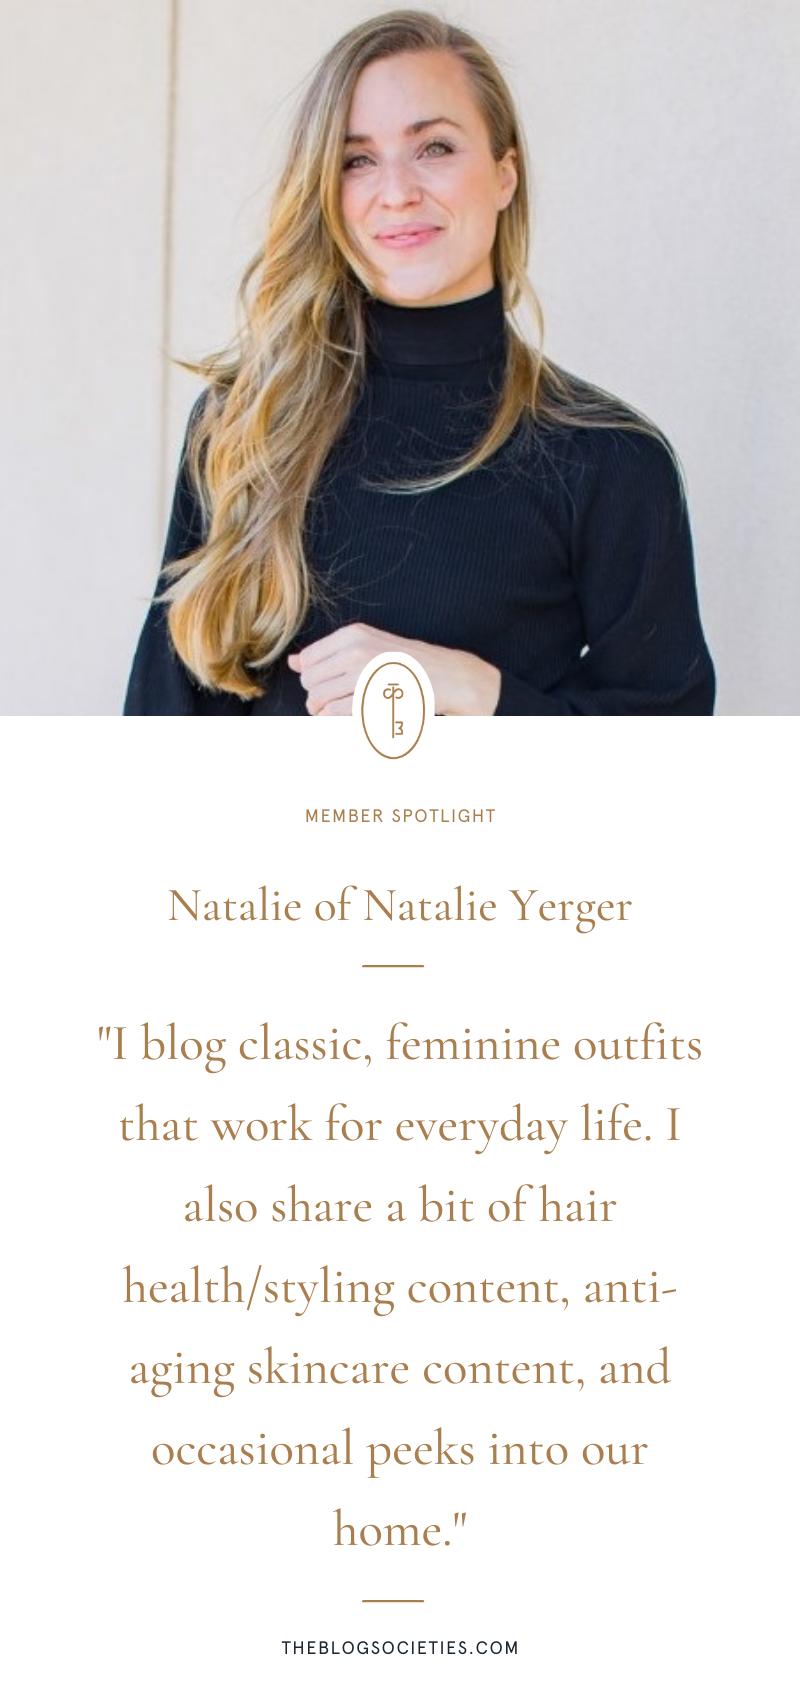 Natalie of Natalie Yerger